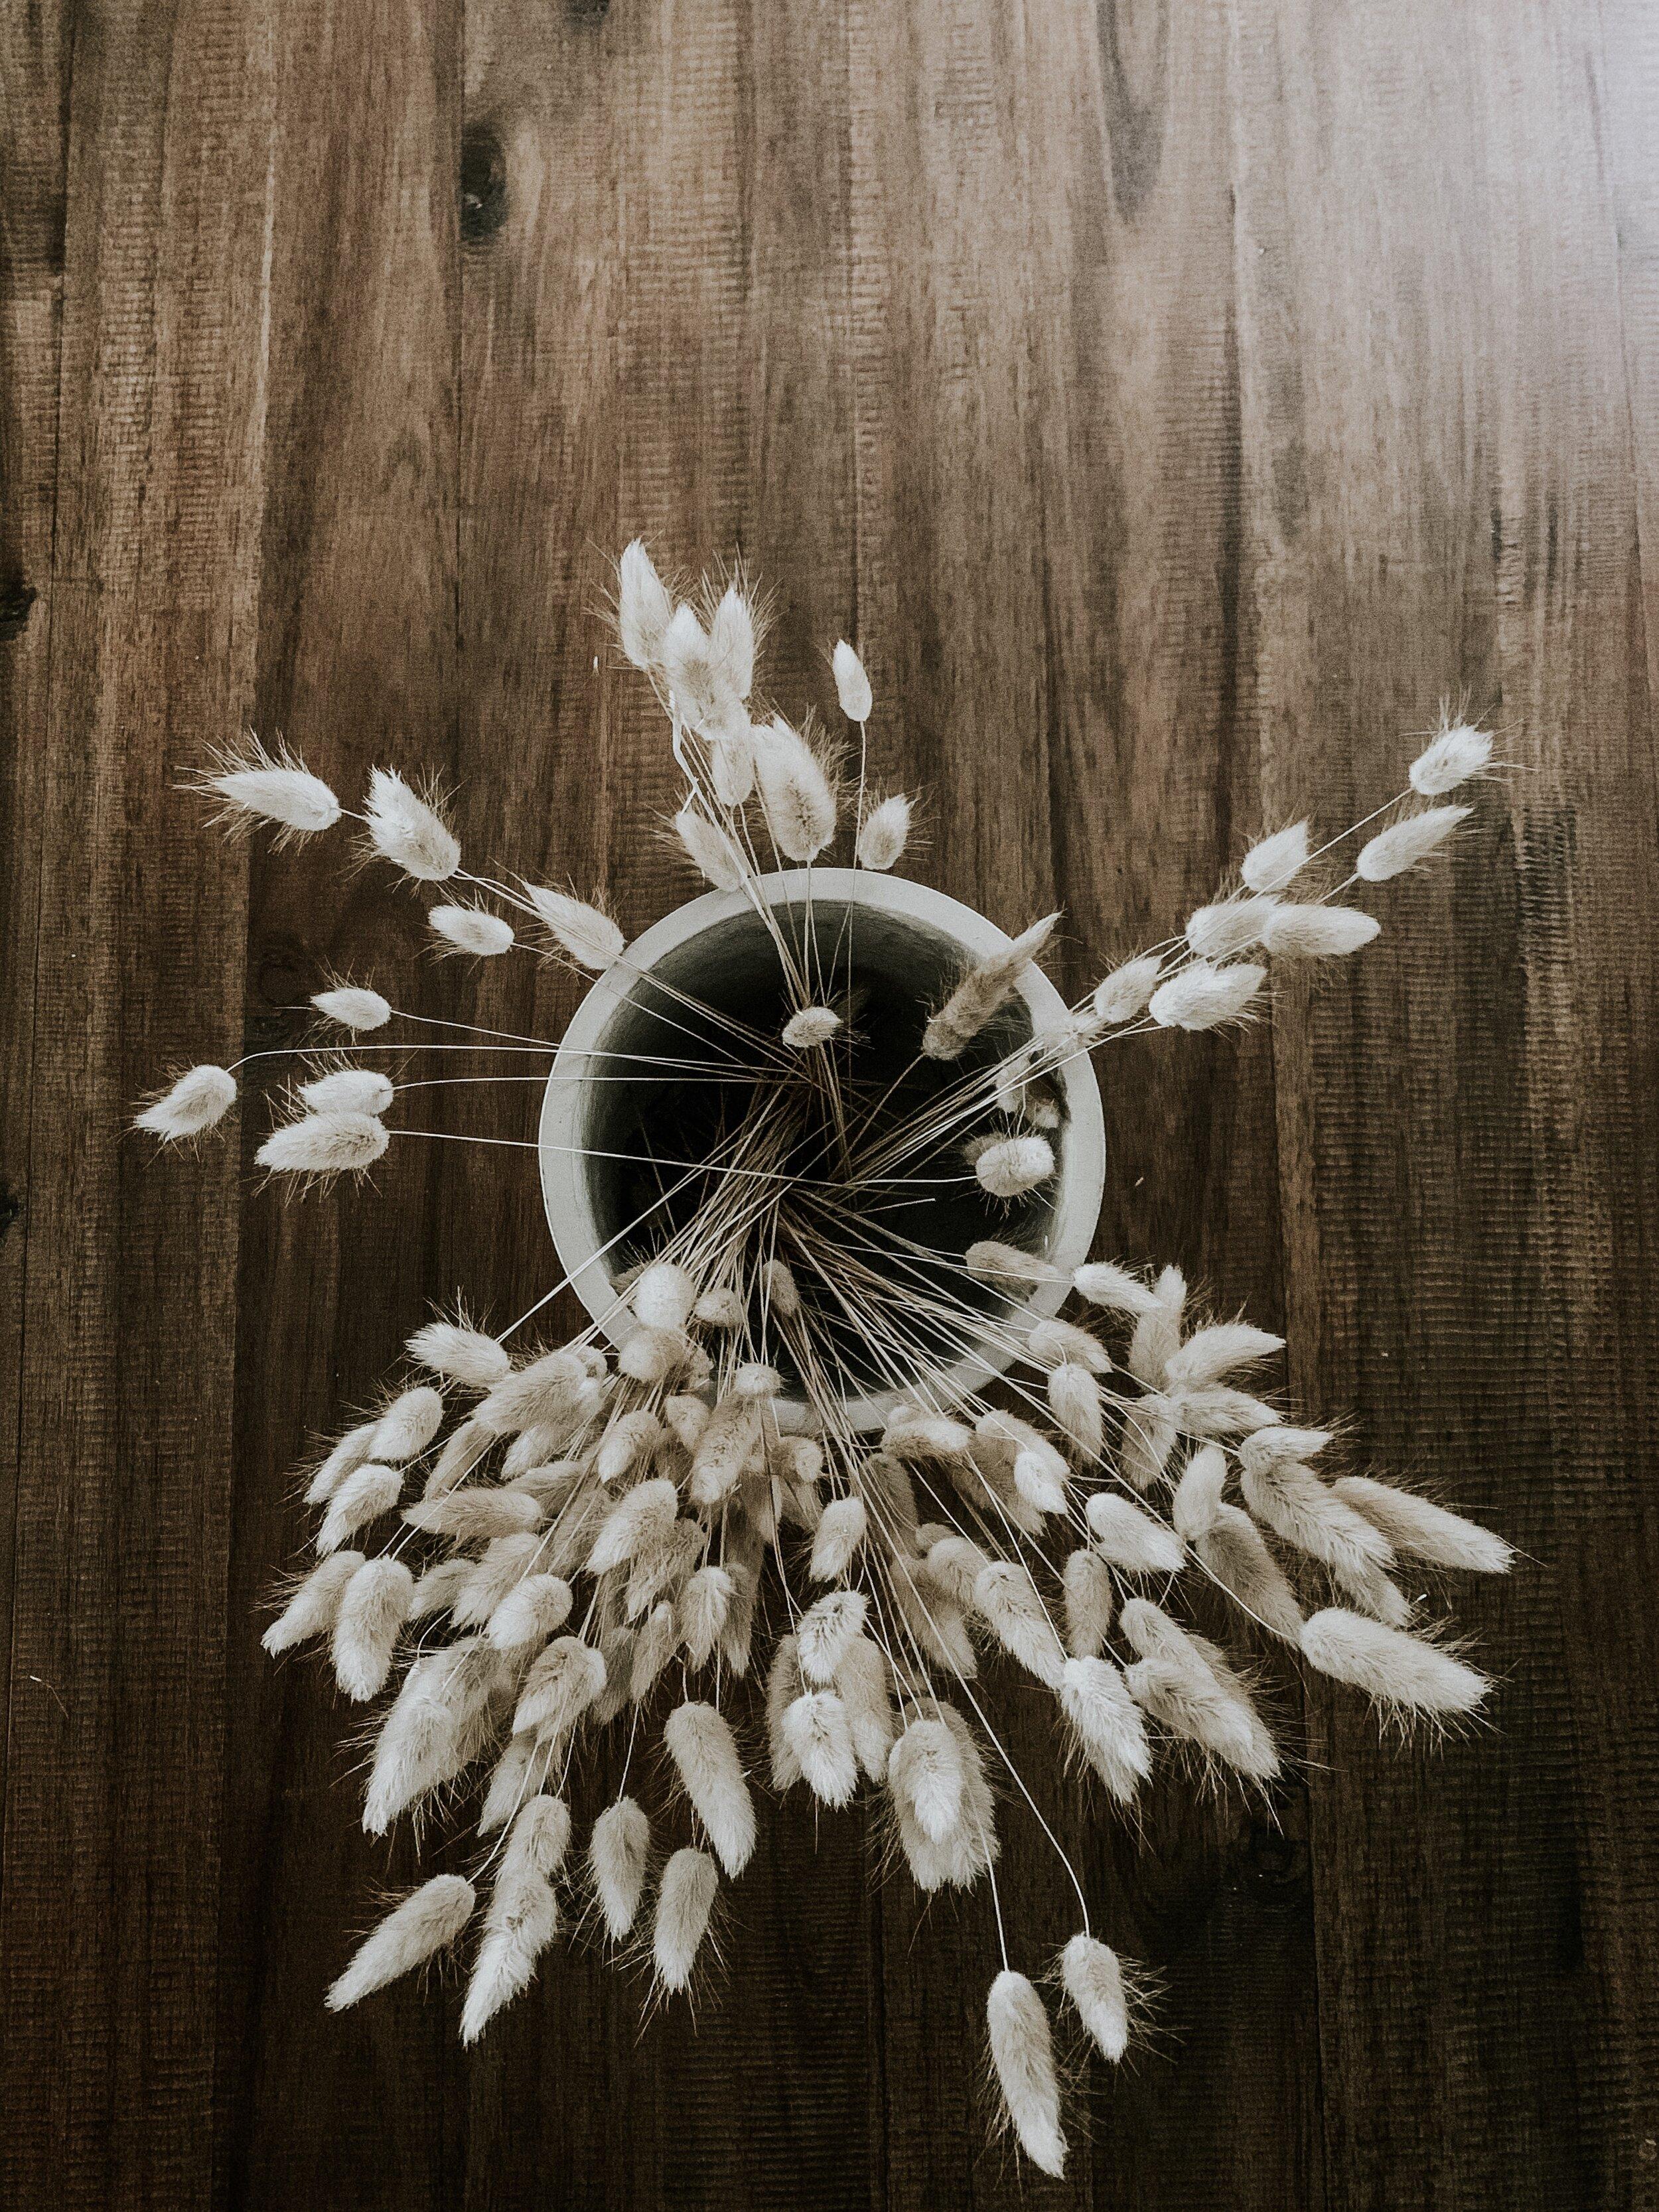 Pampus grass table centerpiece